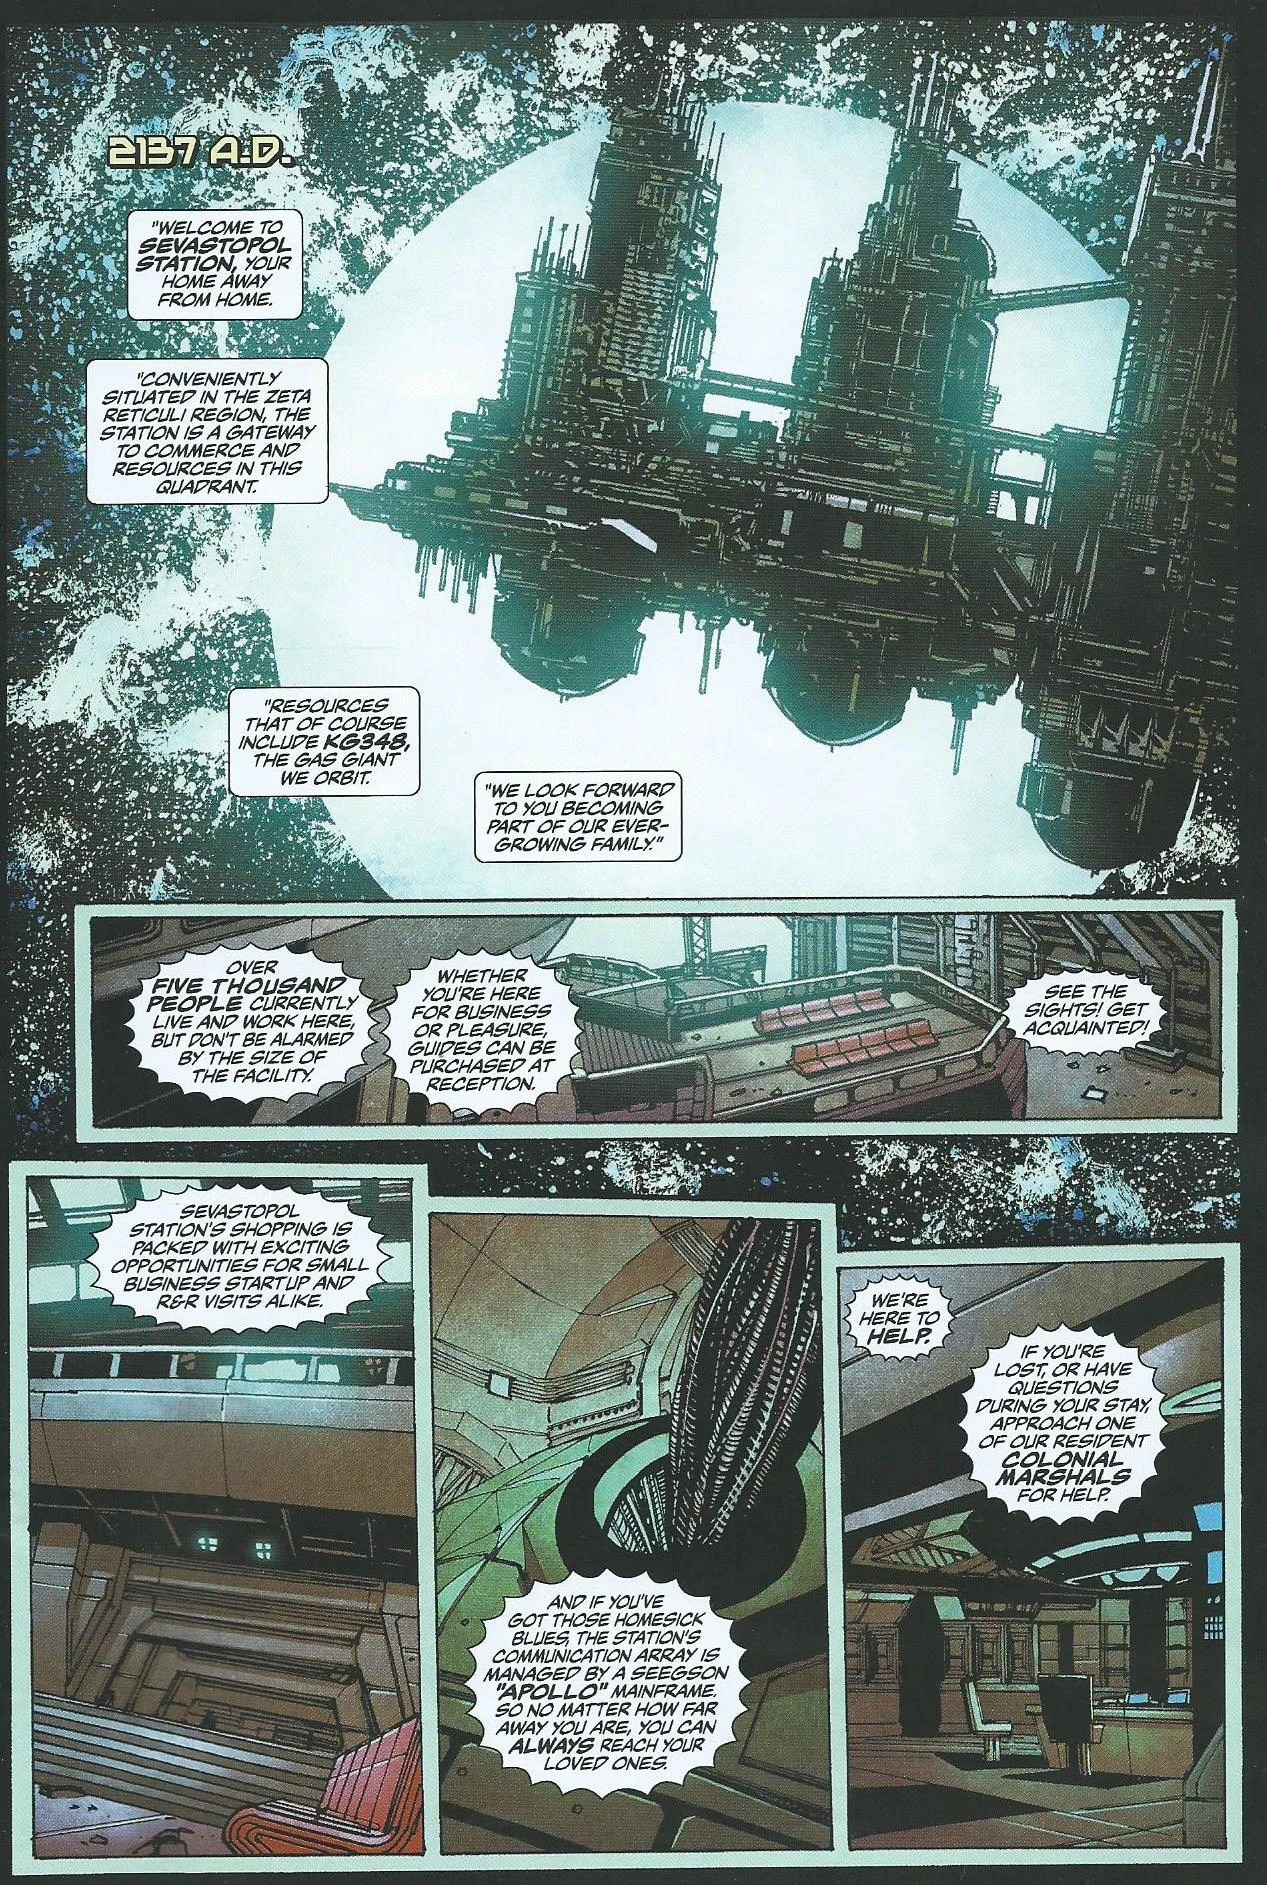 Alien Isolation comic  WeylandYutani corporation Wiki